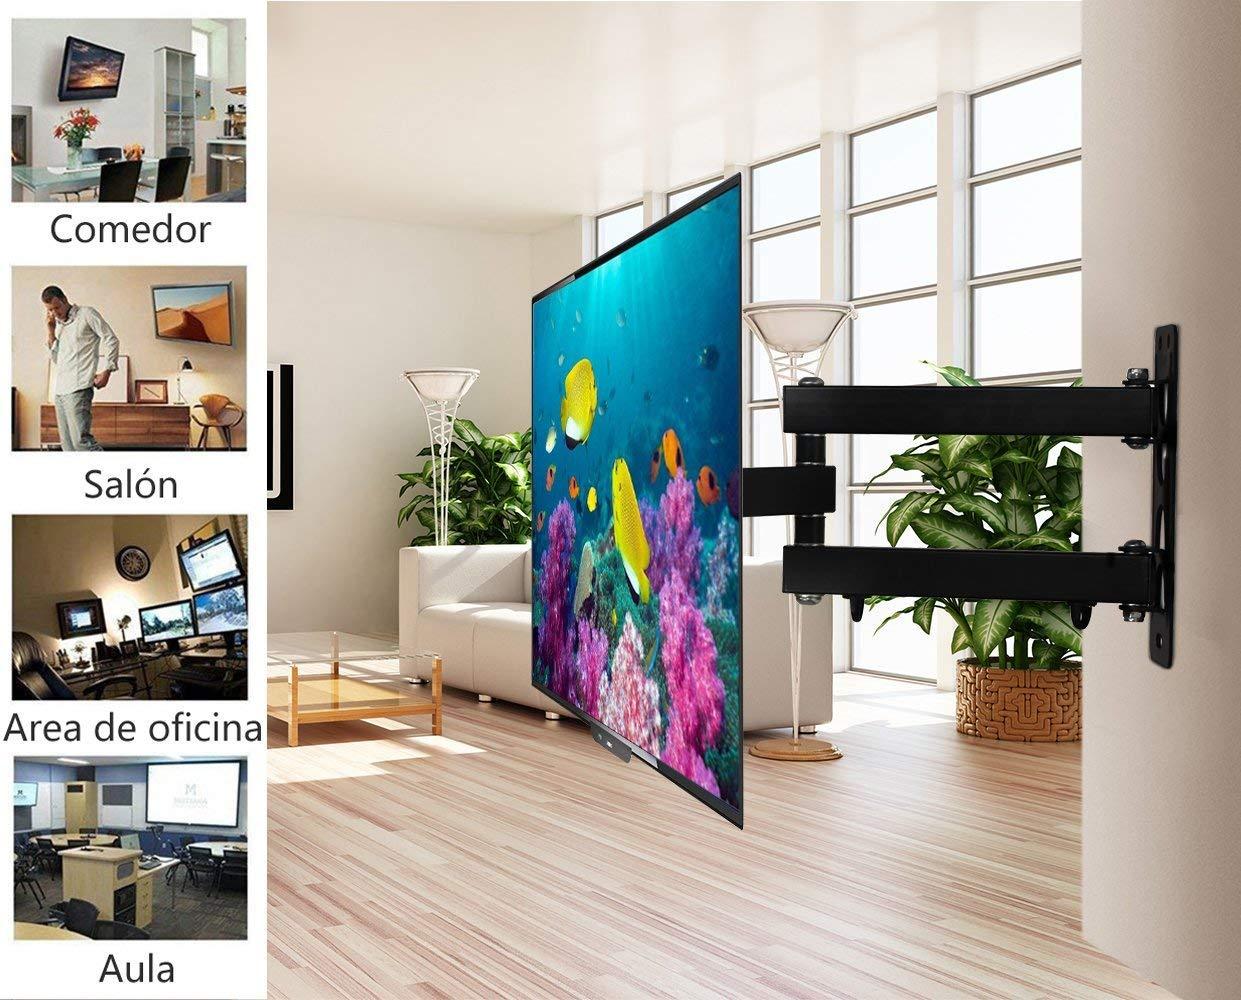 MODERN LIFE Soporte de Pared para TV 10-42 Pulgadas(25-106cm), Inclinable y Giratorio, Máx Vesa 200x200mm, Carga 45KG(99lbs), para Televisores de ...